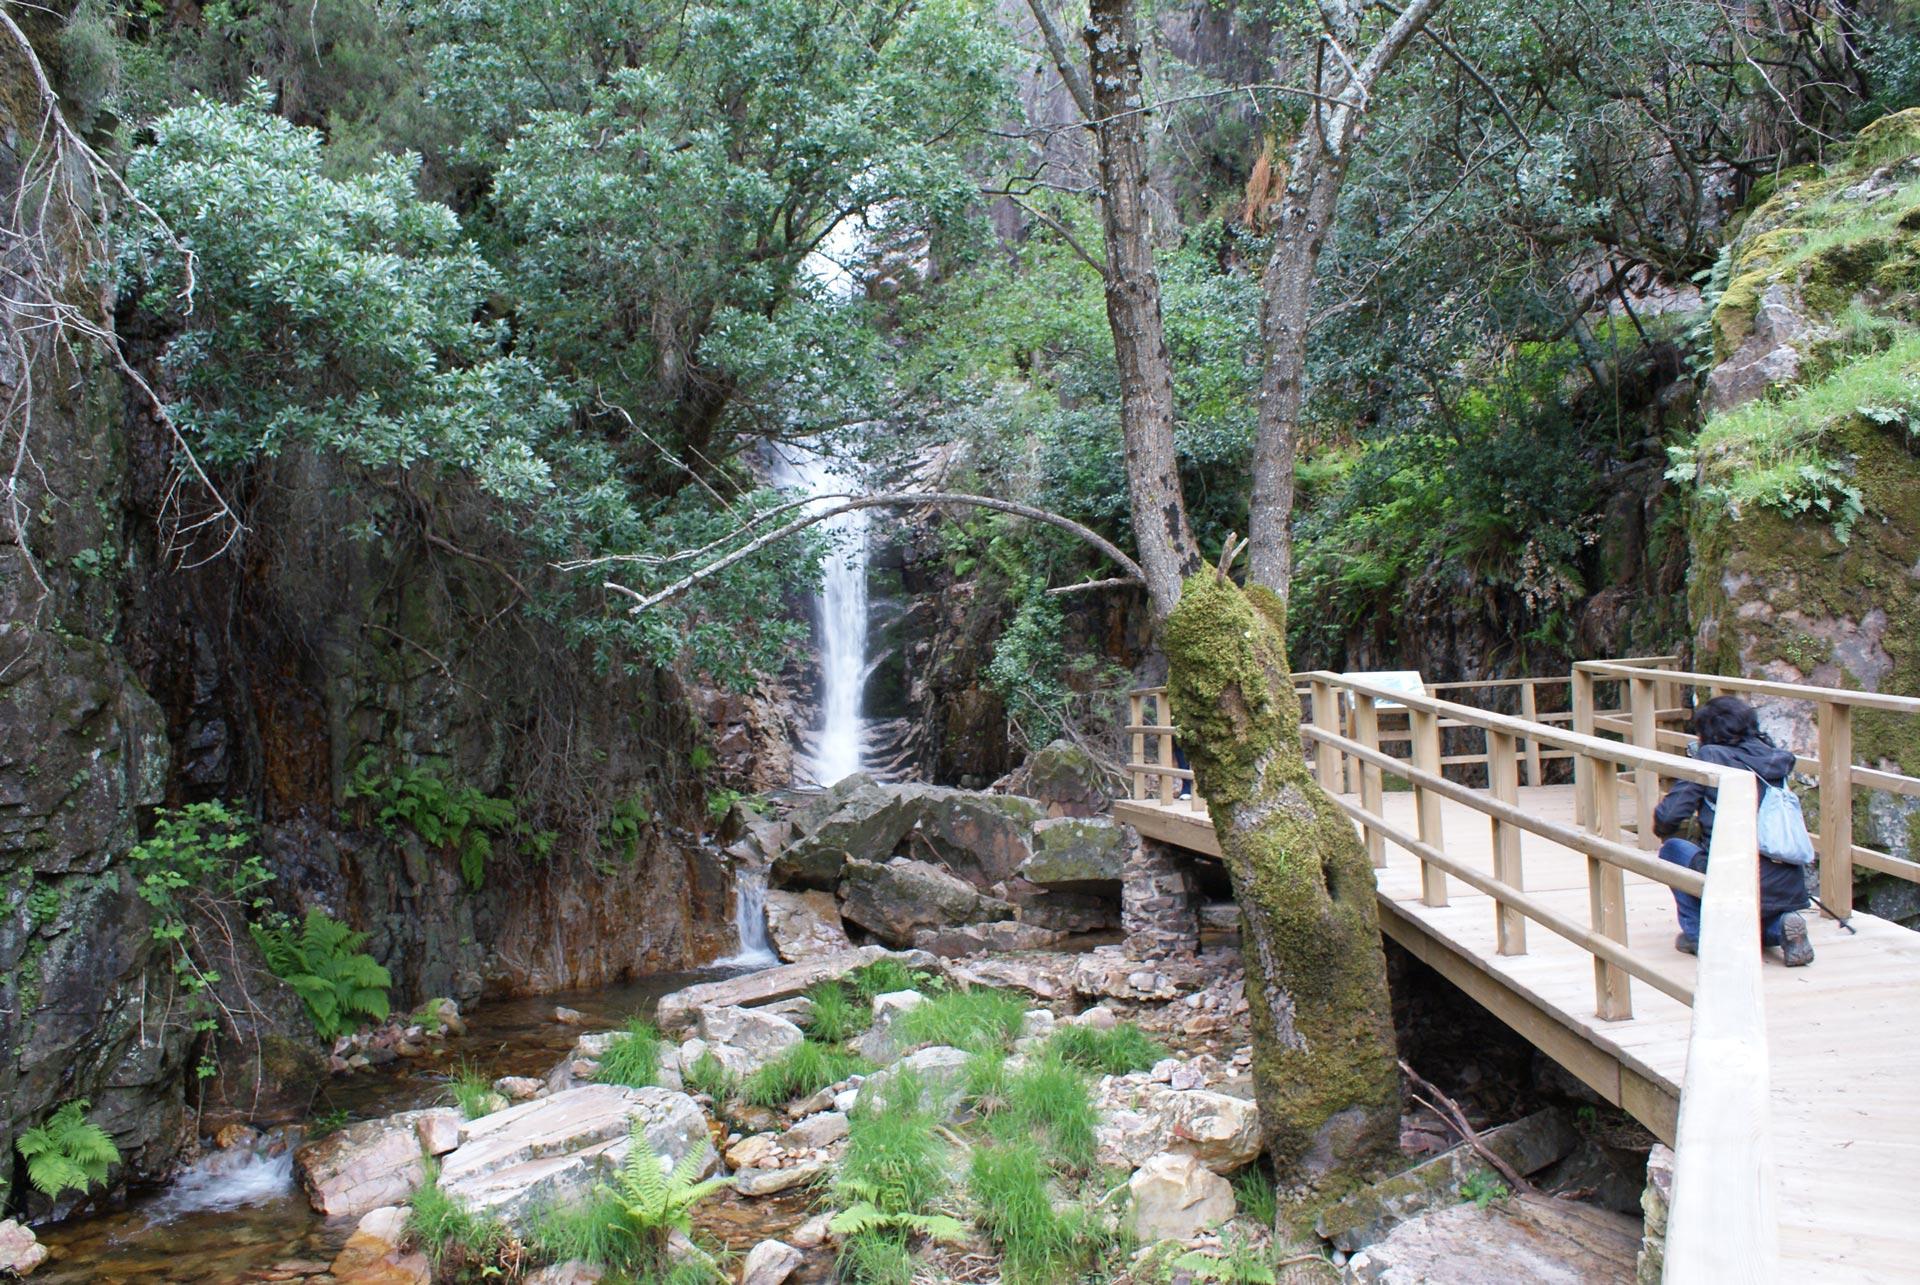 Ruta-del-Chorro,-Chorrera-Chica-y-Rocigalgo